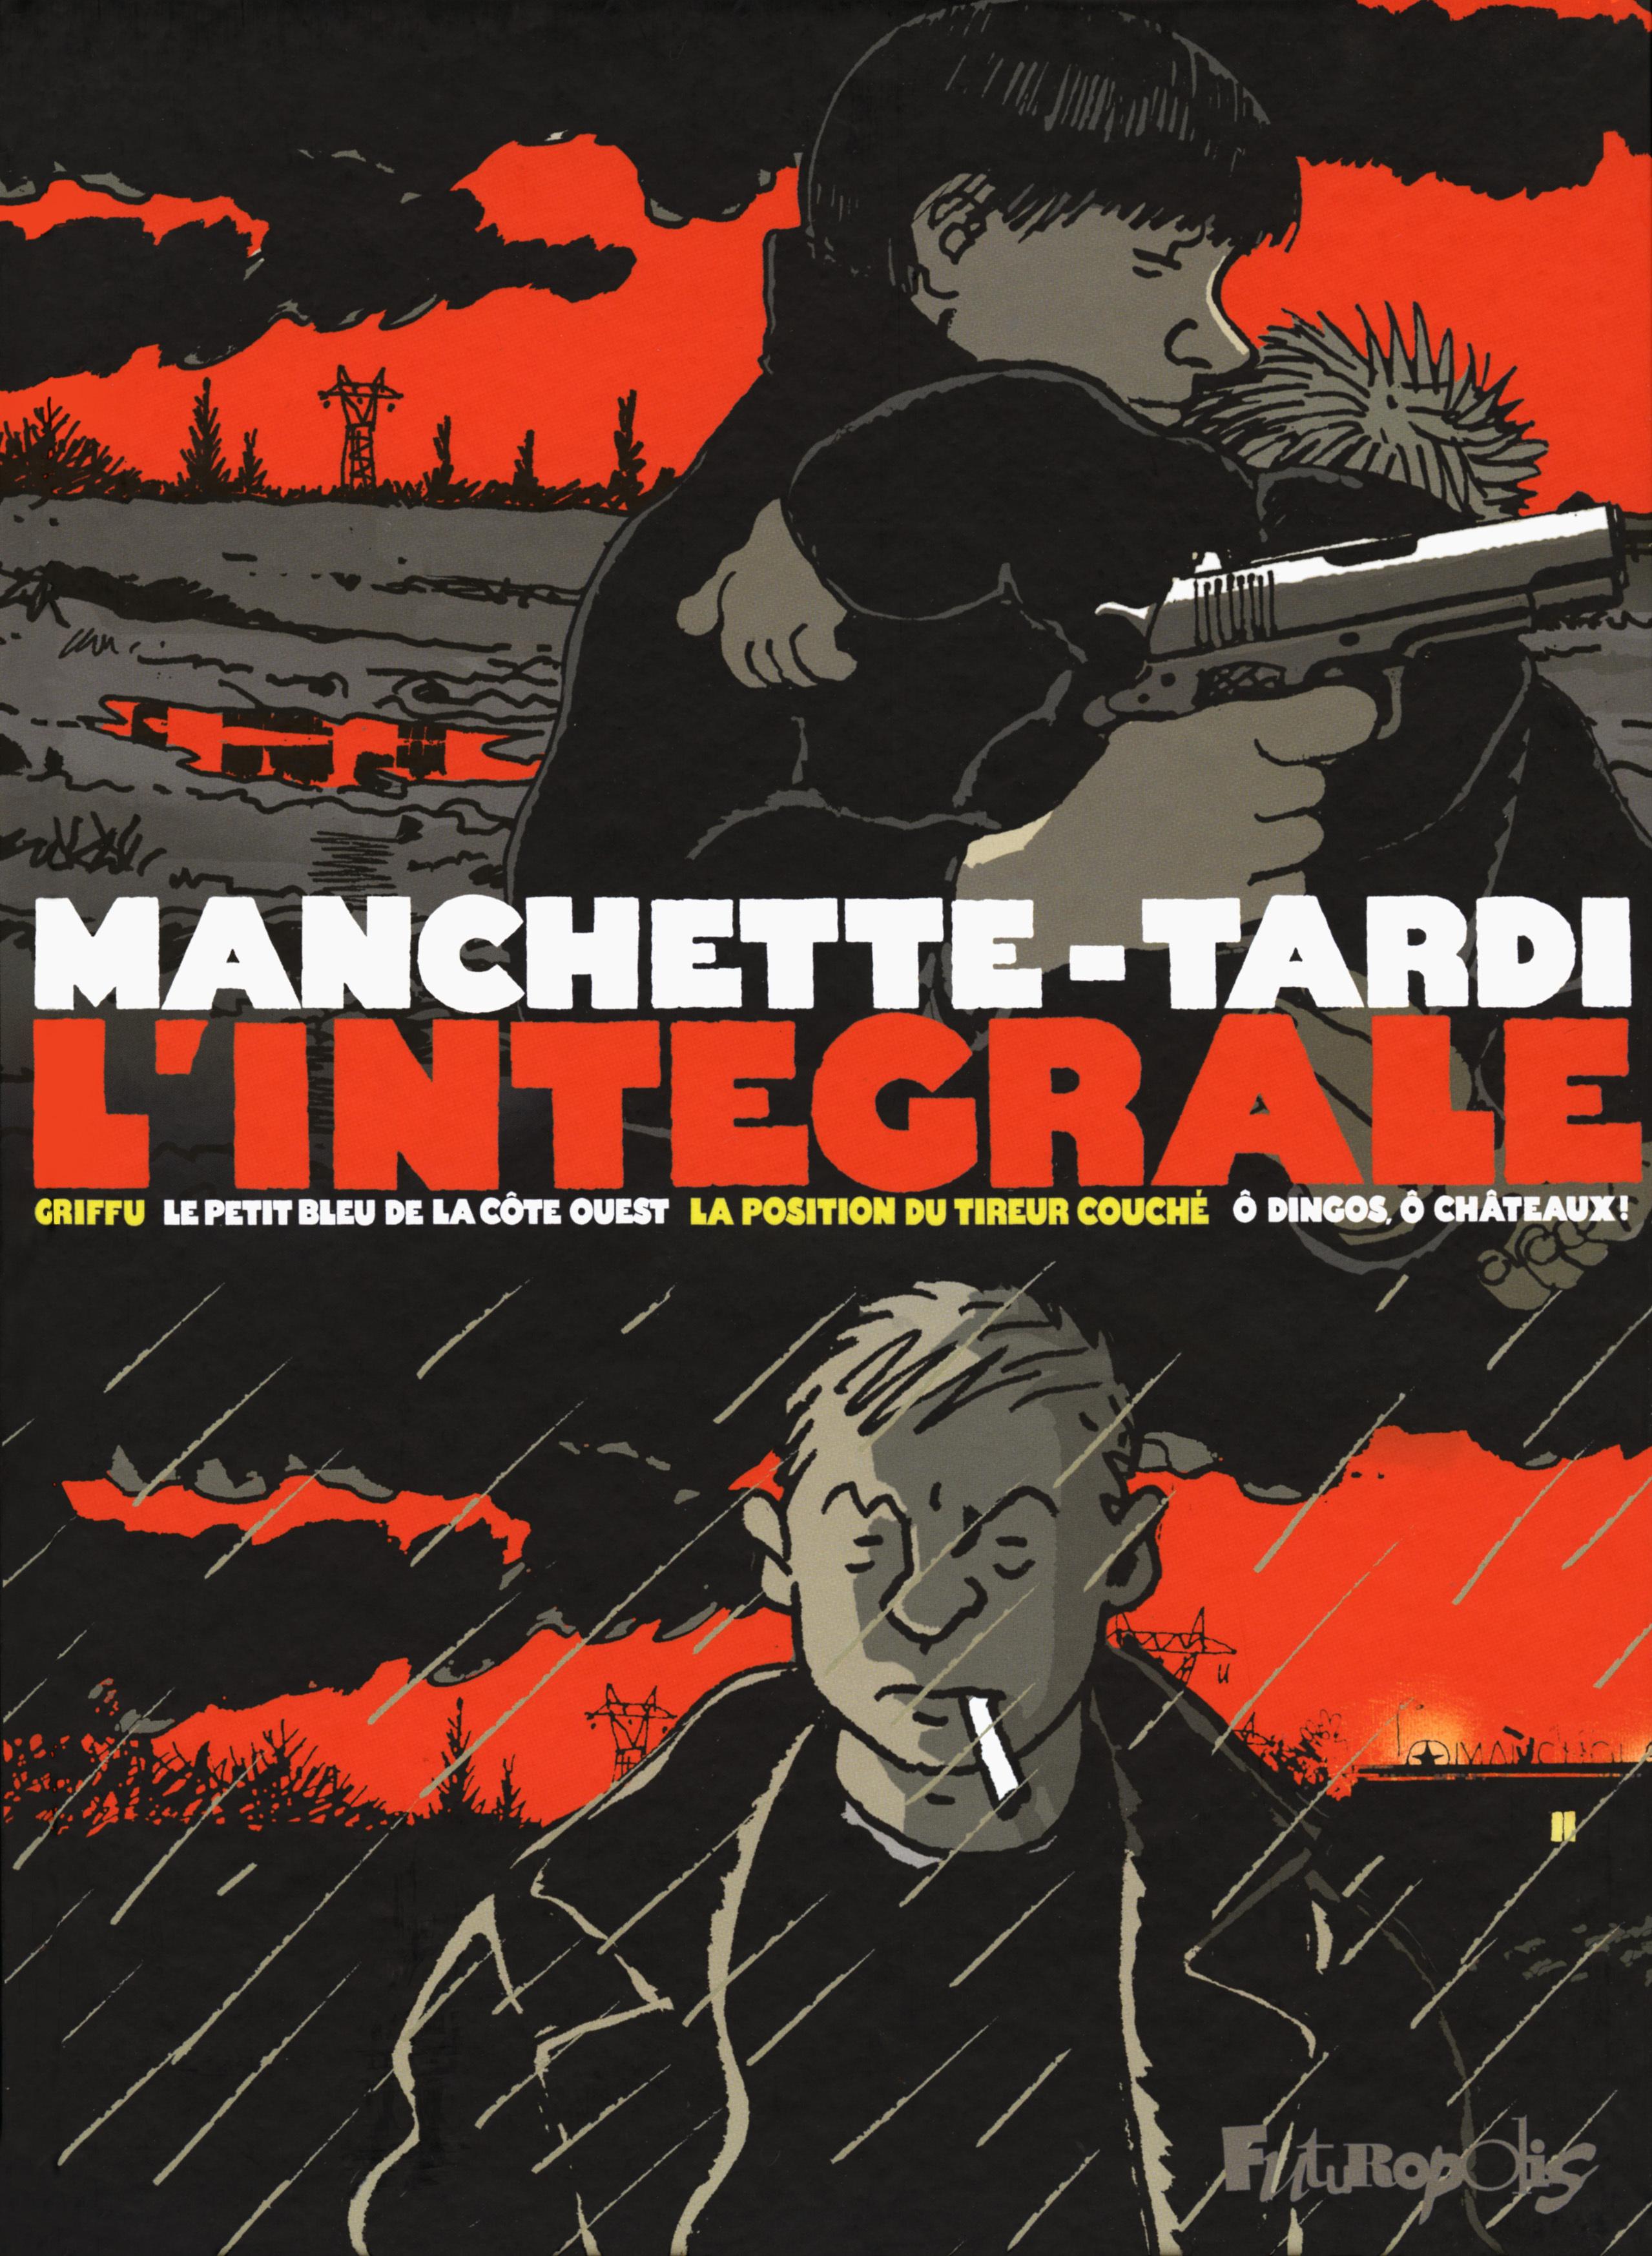 MANCHETTE-TARDI L'INTEGRALE